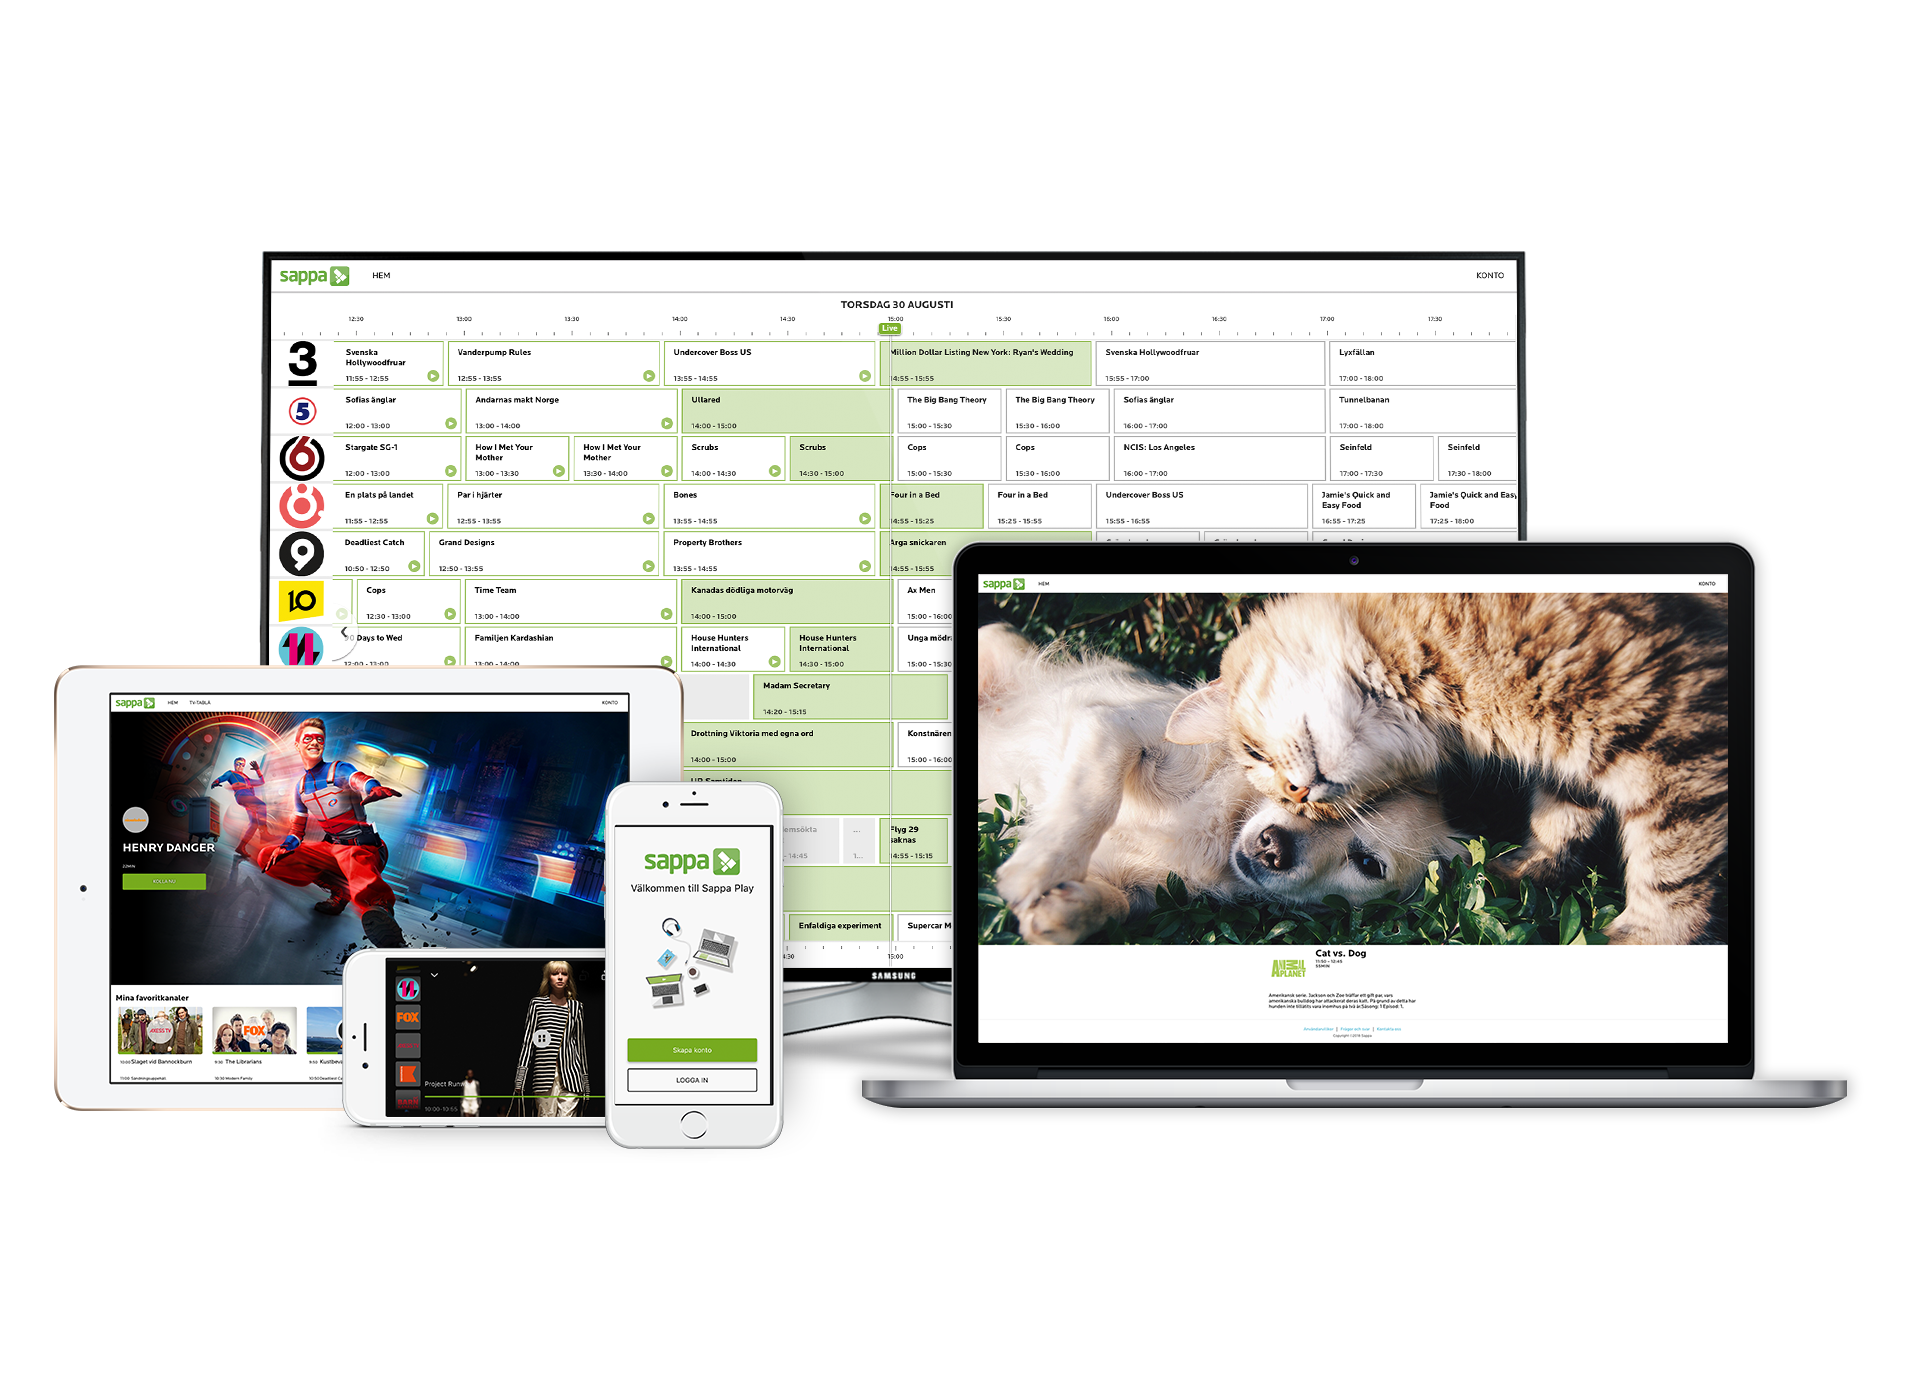 Sappa TV Everywhere and IPTV solution | Live OTT service